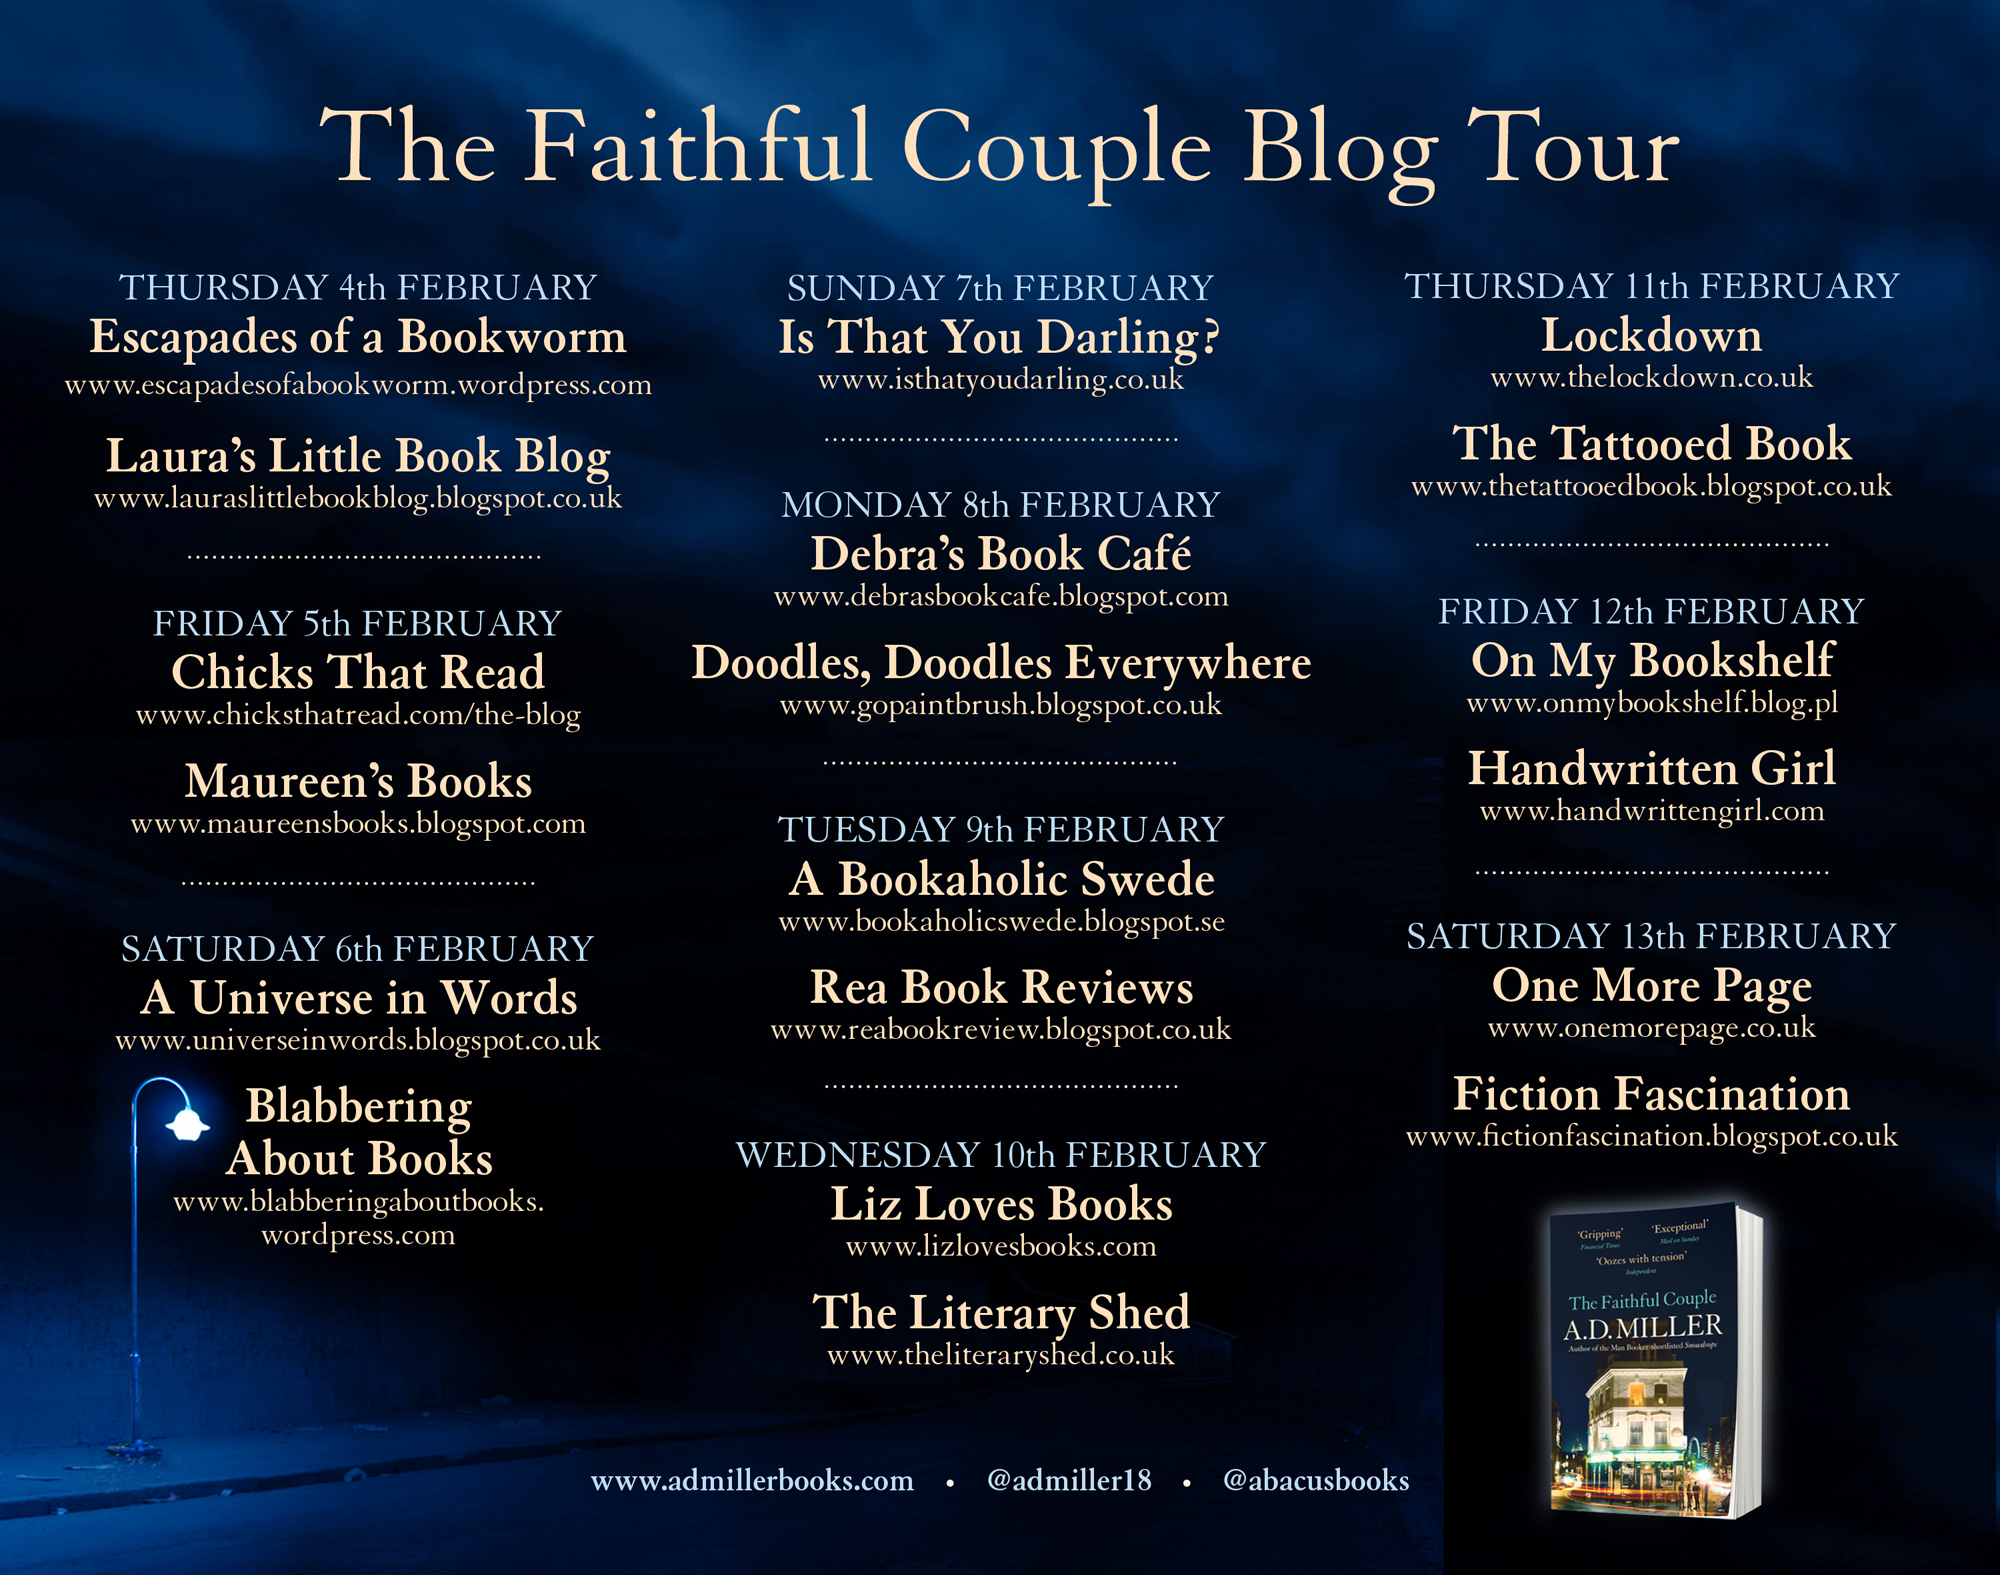 The Faithful Couple Book Tour